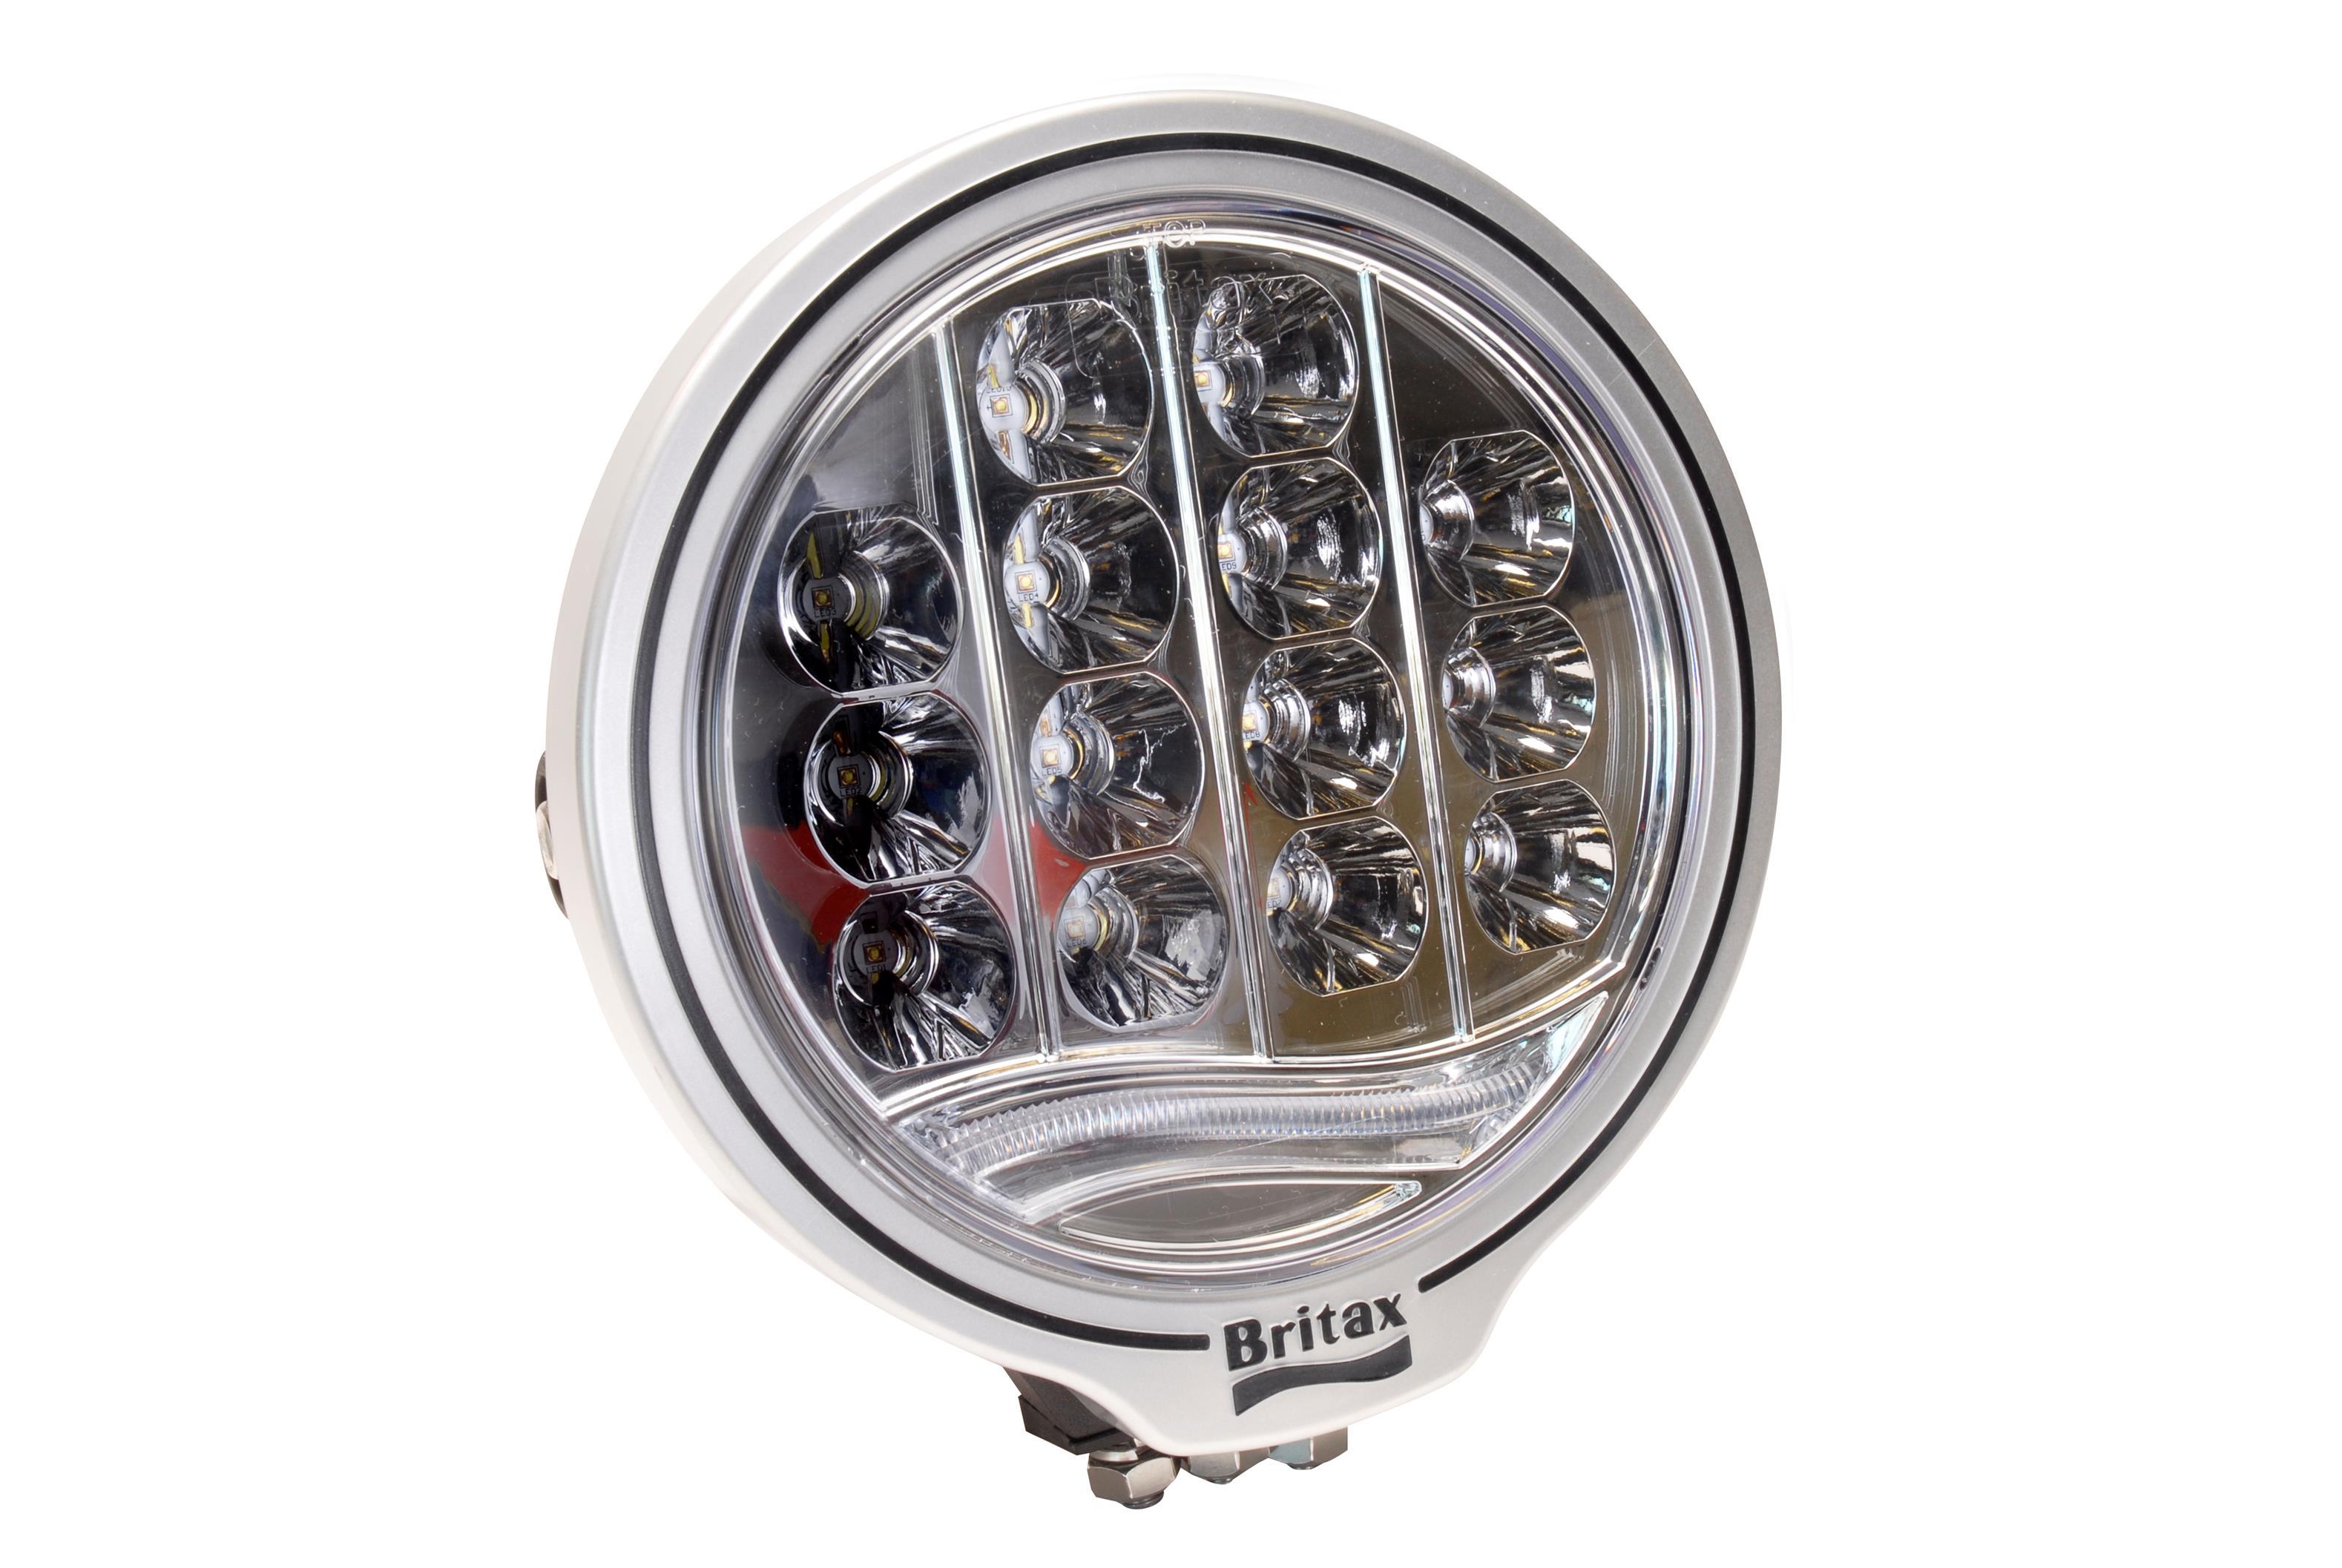 Britax L100 LED Driving Lamp